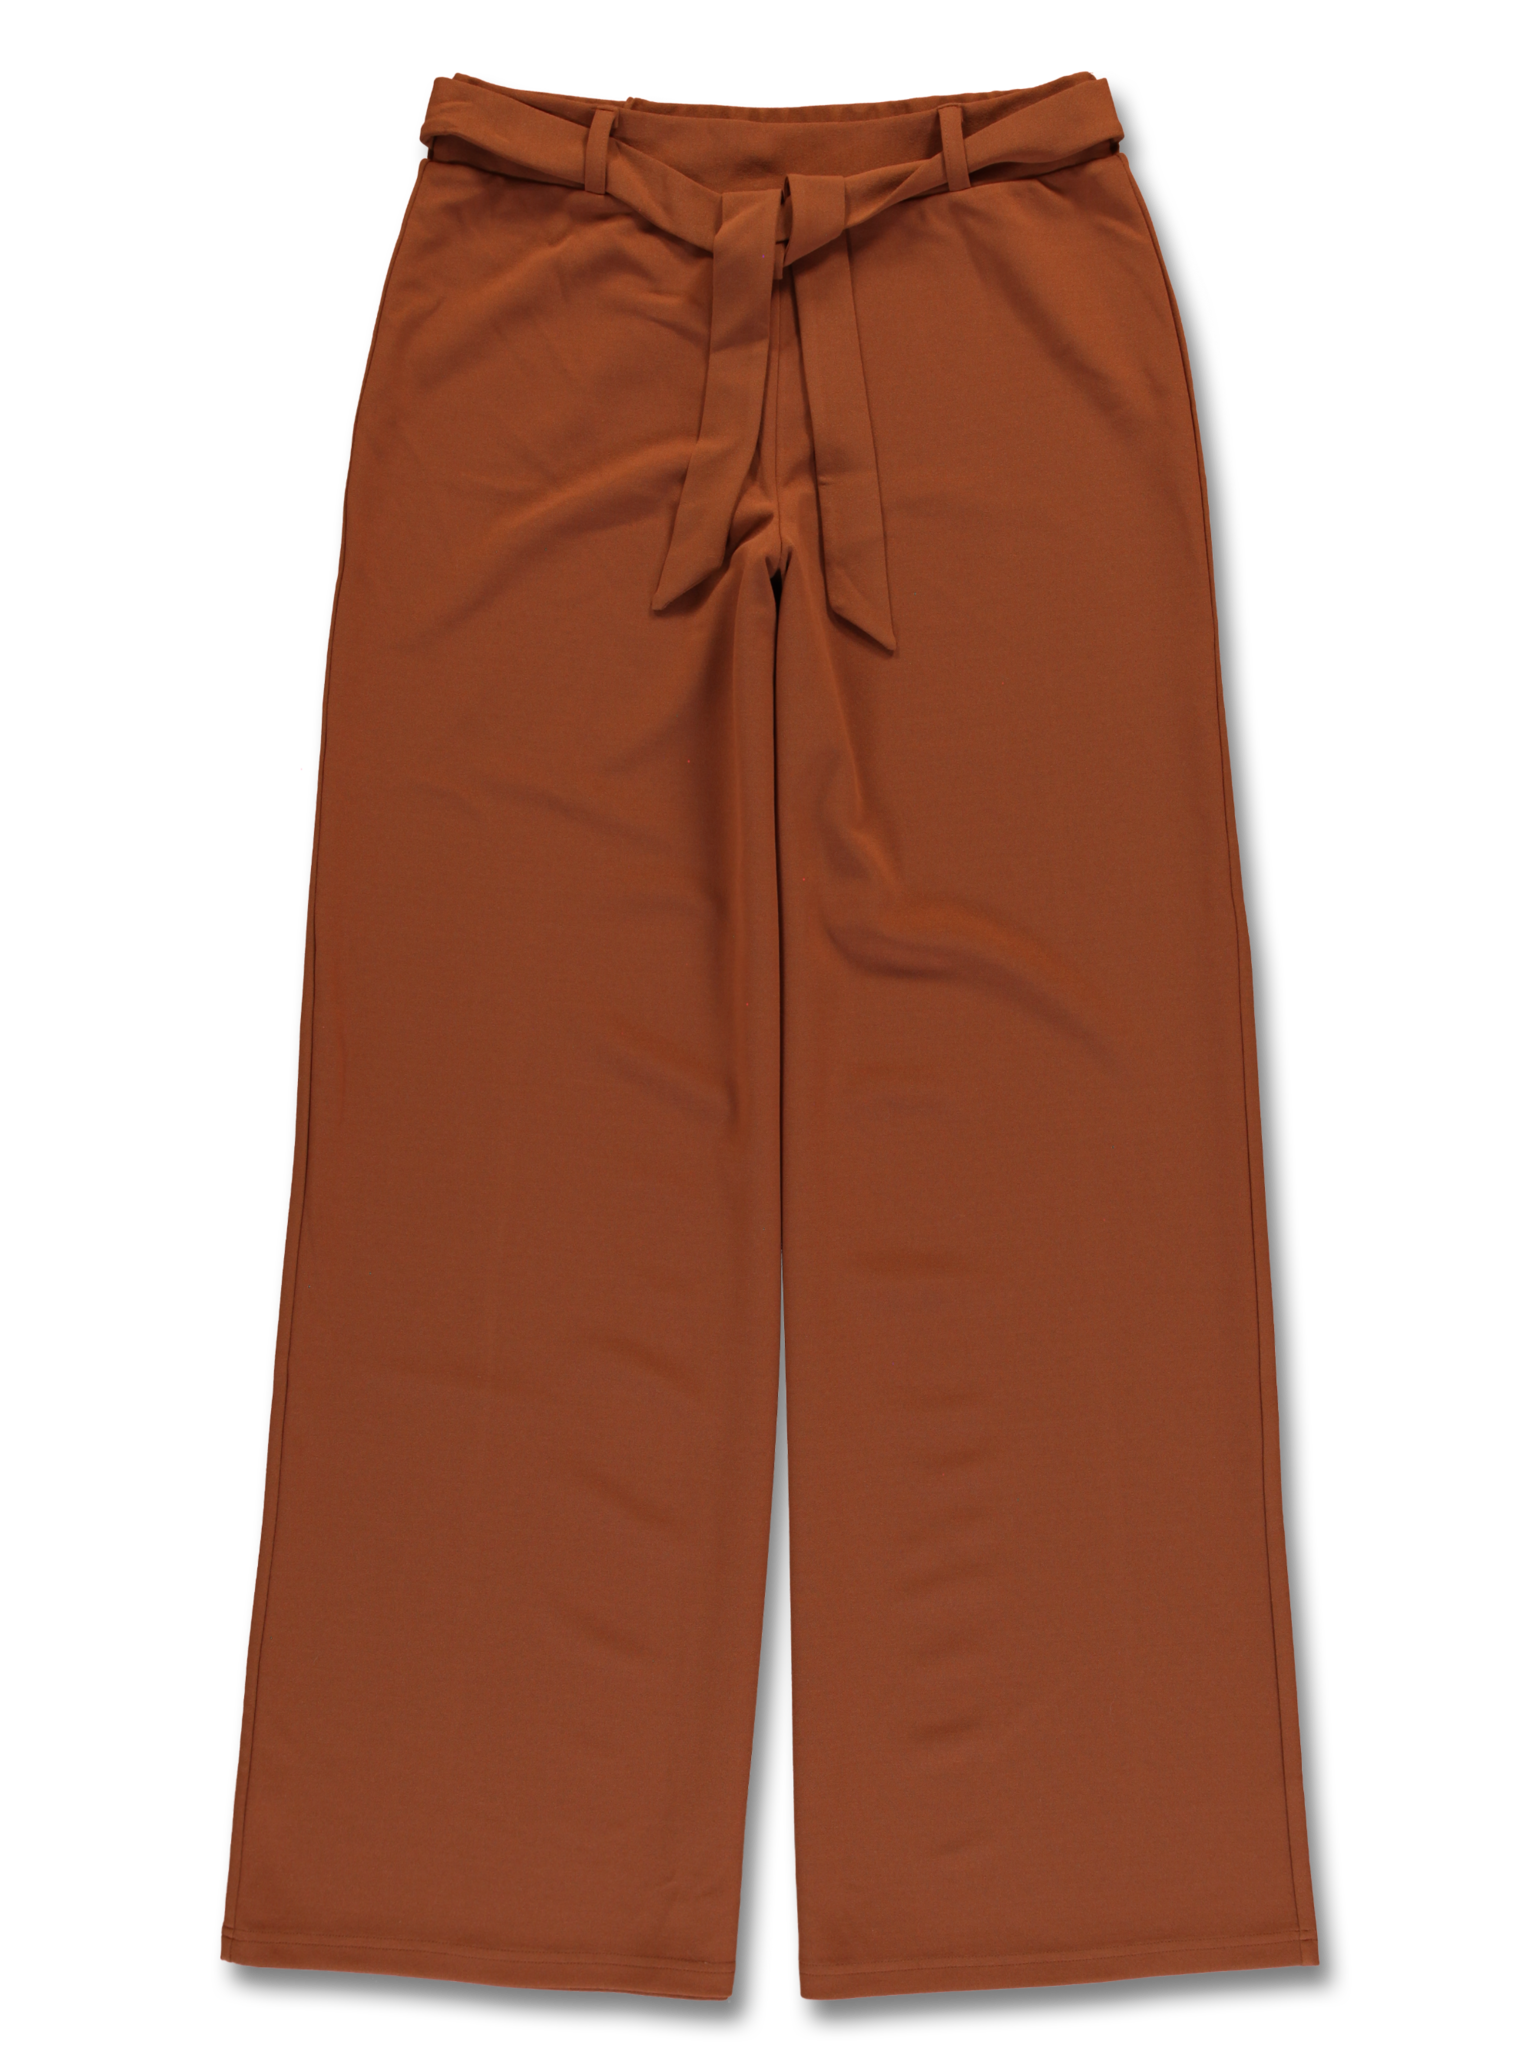 All Brands | Winterproducts Ladies | Pants | 18 pcs/box